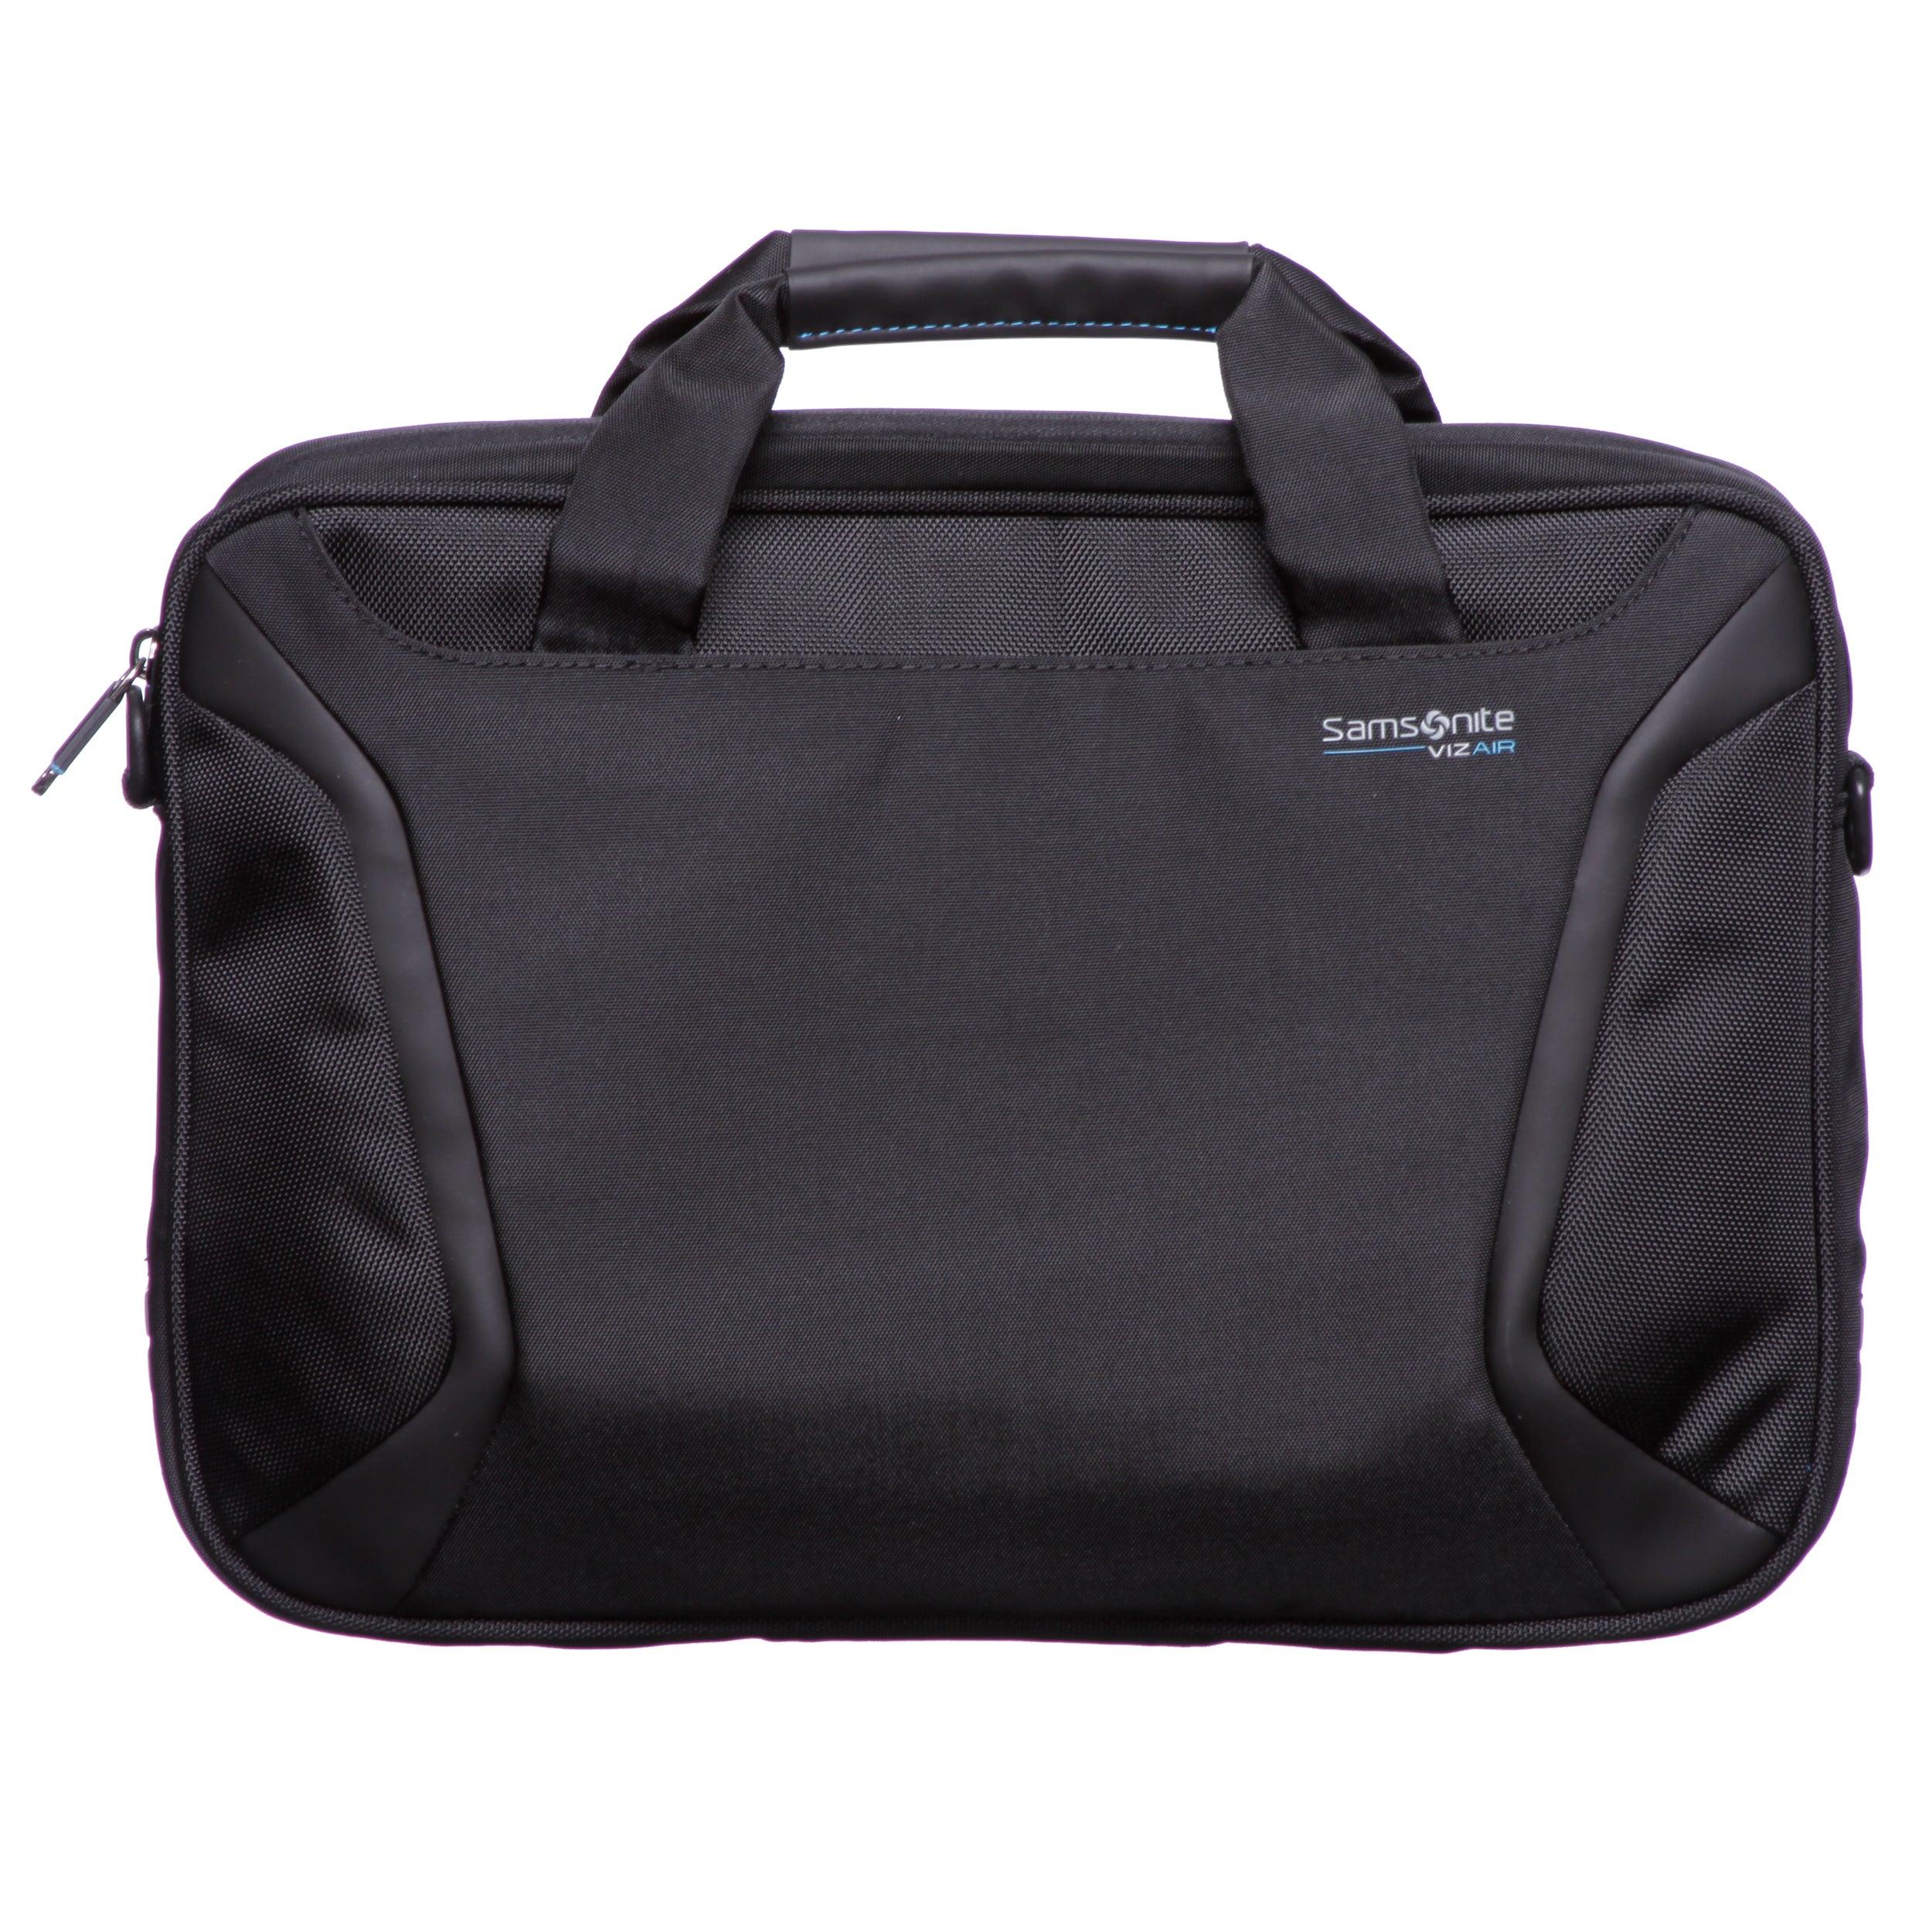 4ef418b9ca2e Samsonite VIZ AIR Slim Soft Laptop Briefcase